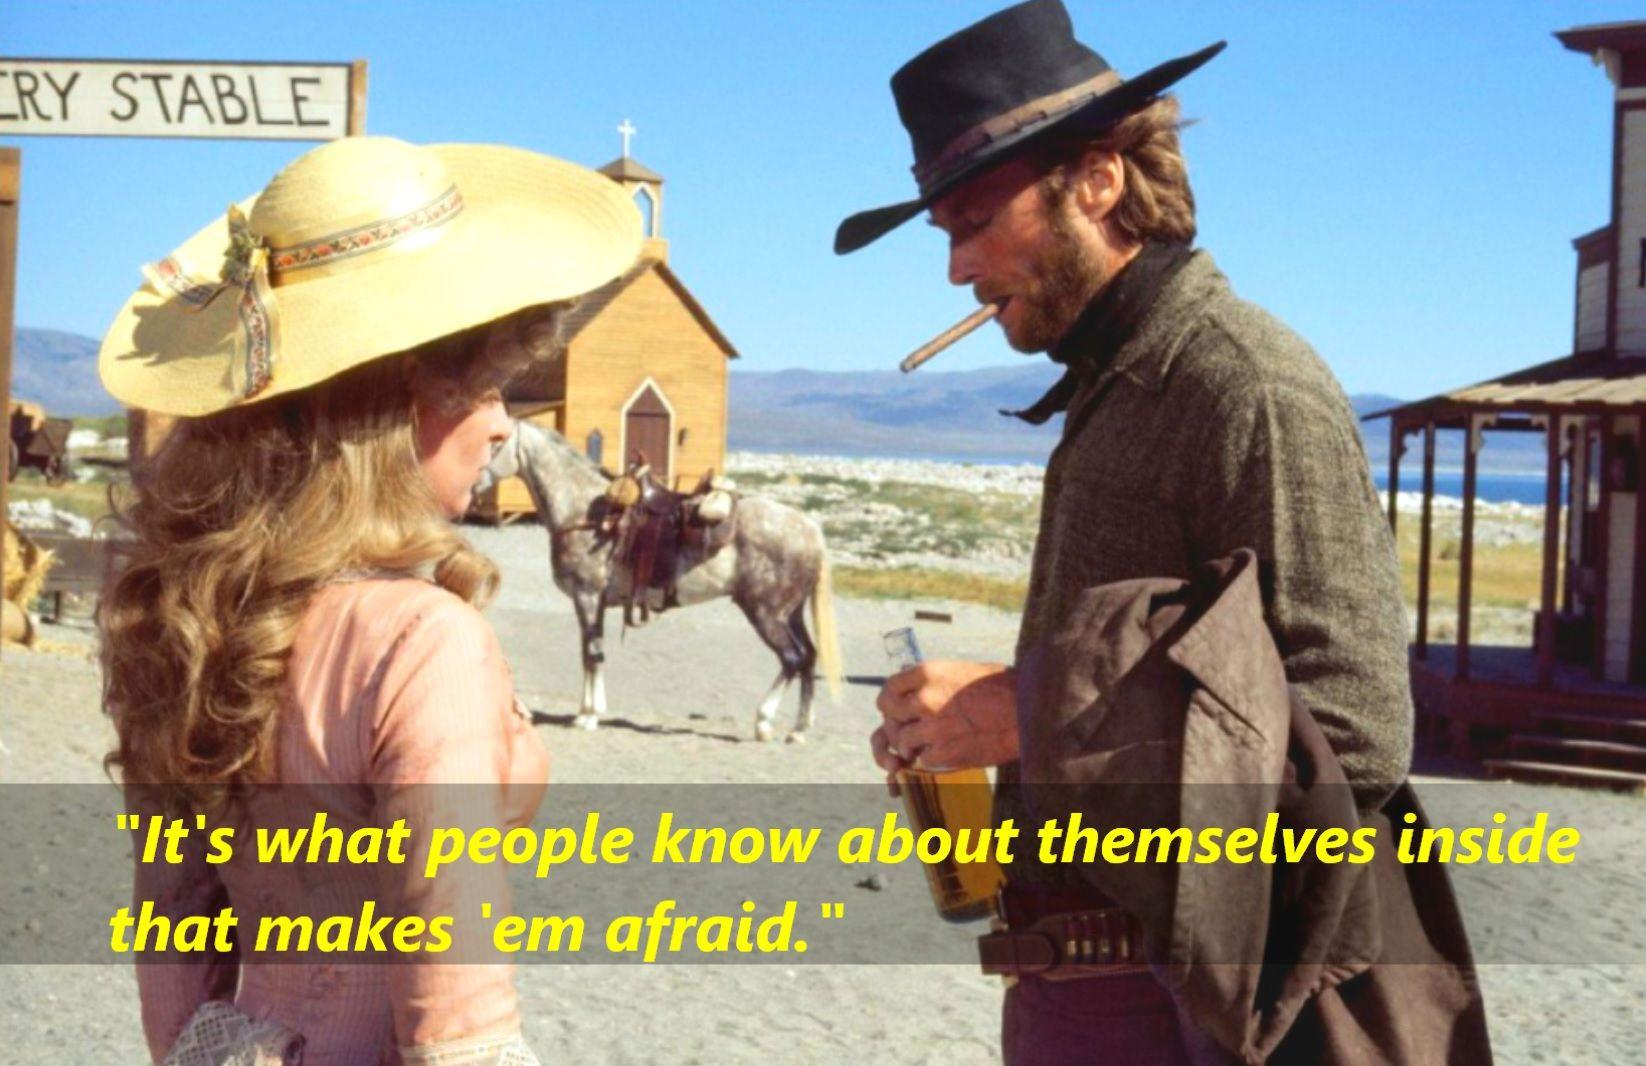 High Plains Drifter 1973 Clint Eastwood As The Stranger Https Www Facebook Com Quotes2reminisce High Plains Drifter Clint Clint Eastwood